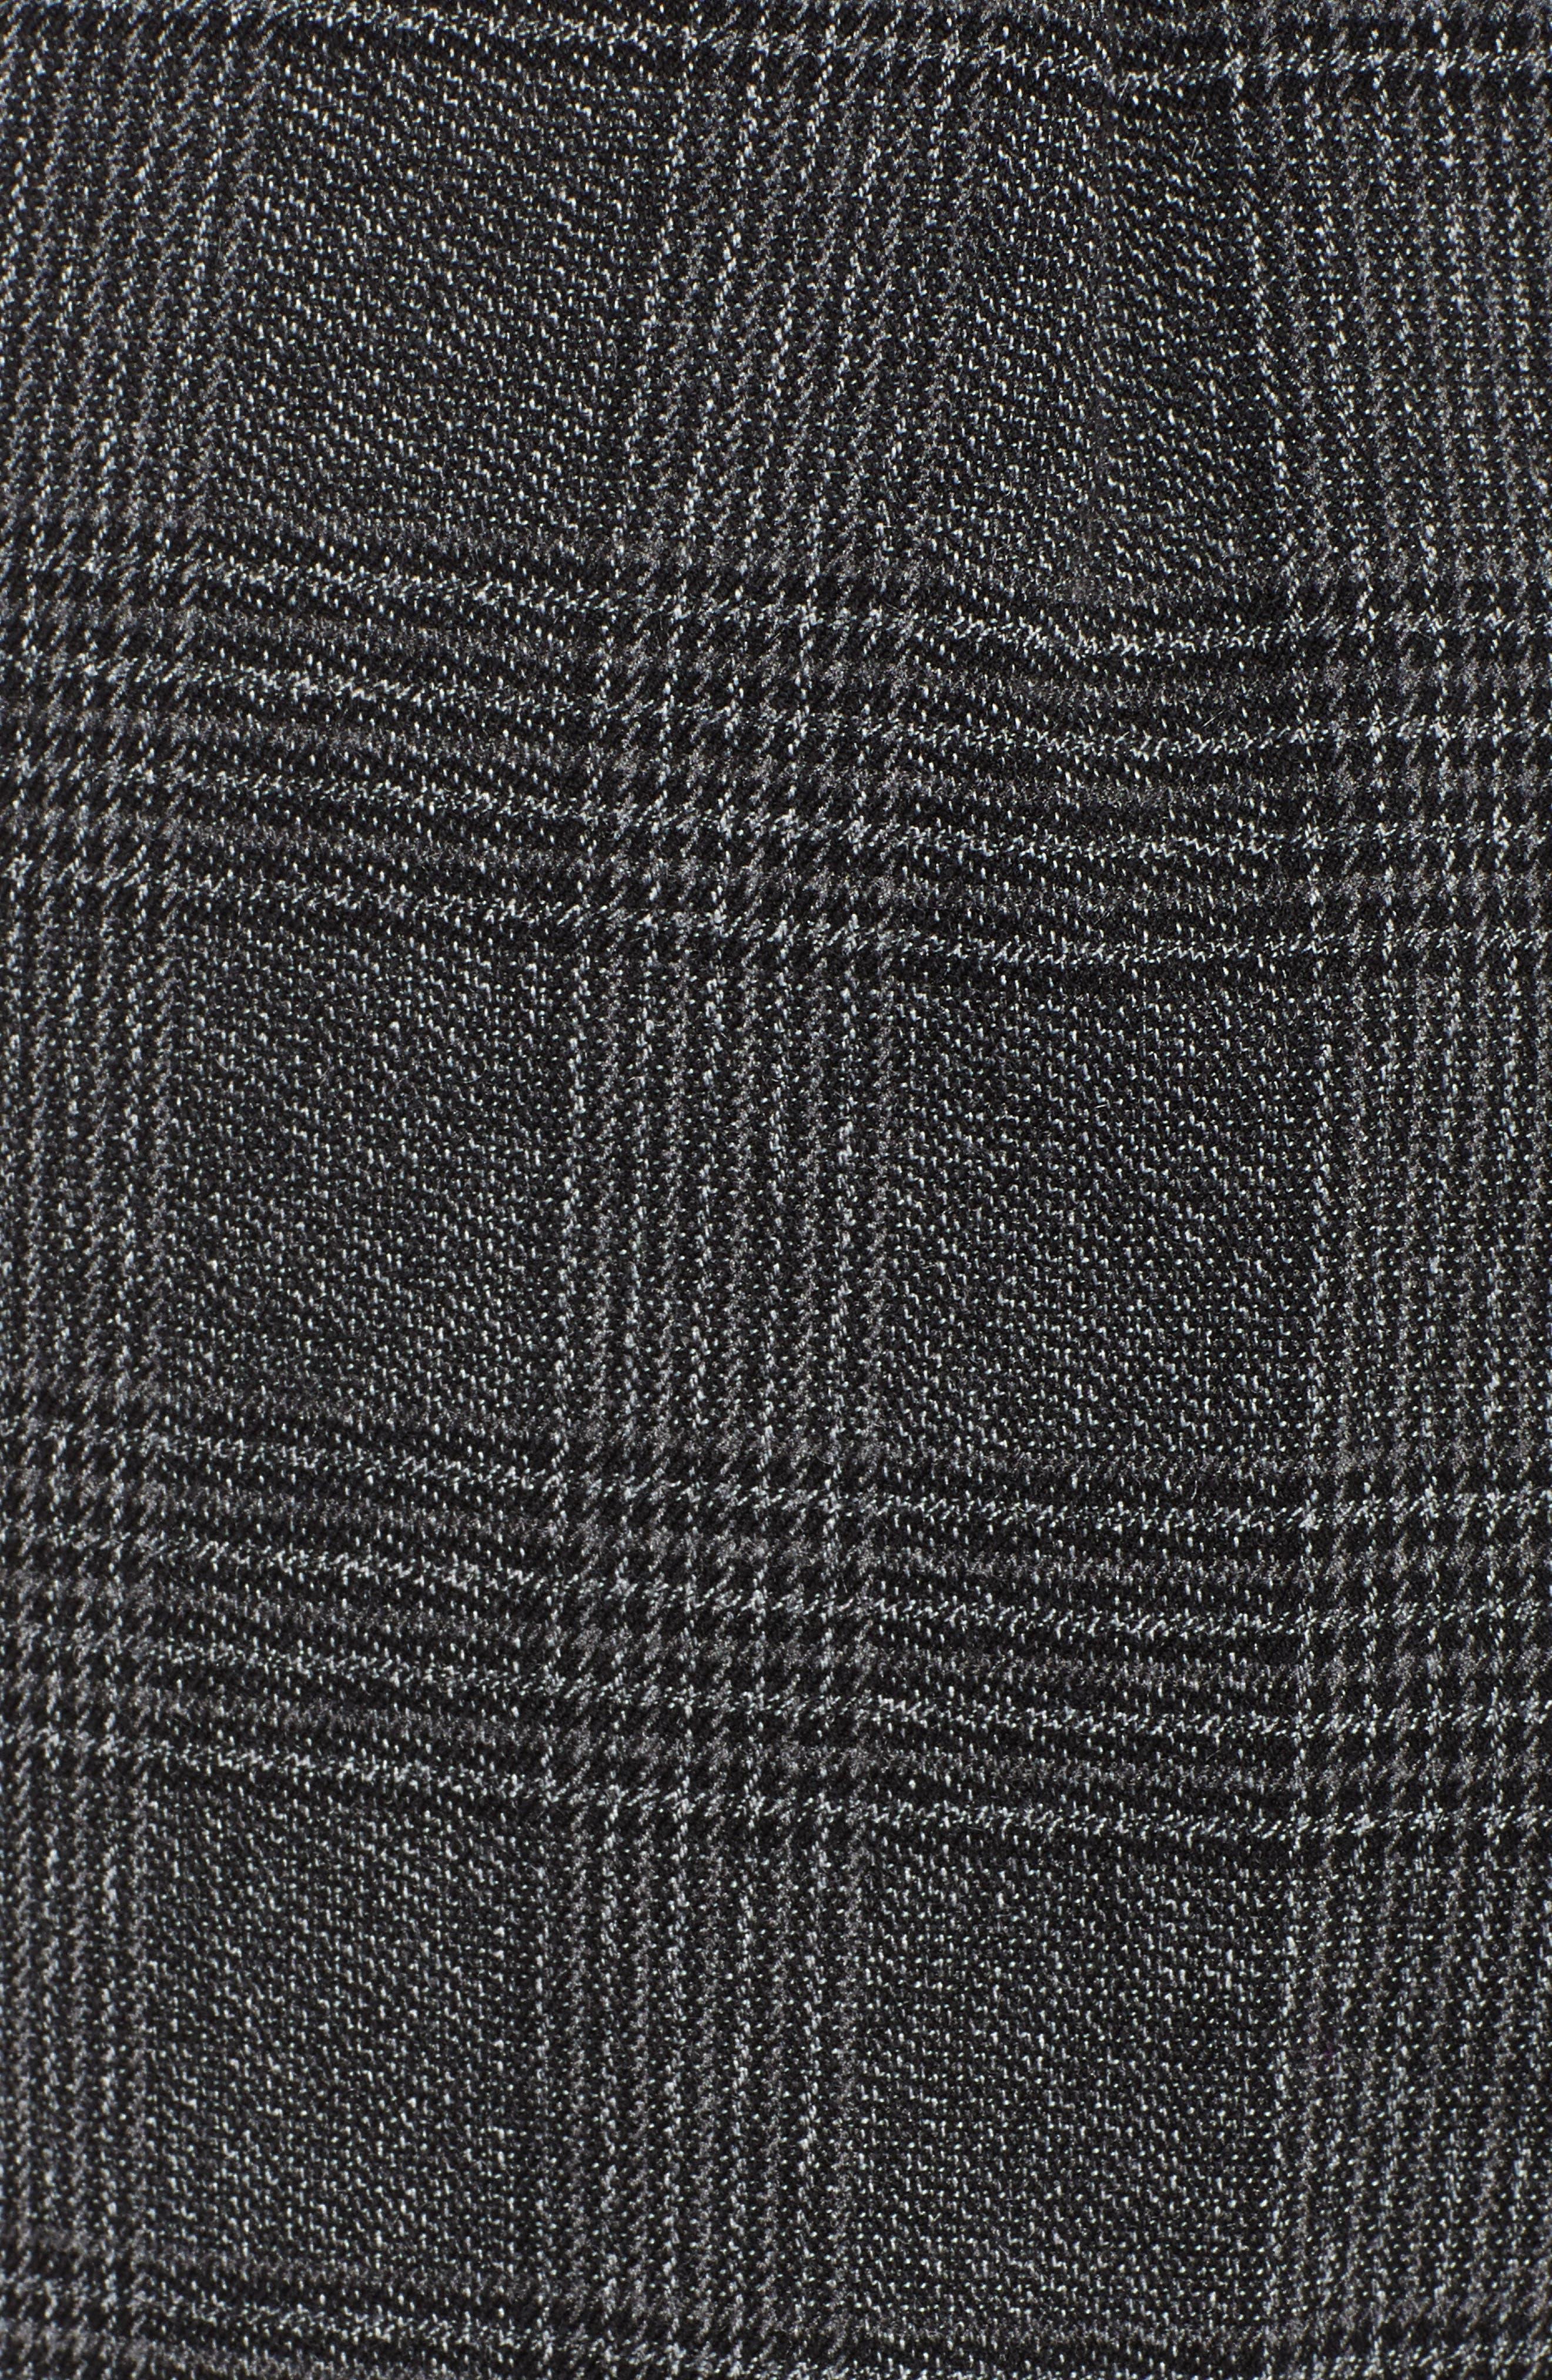 Plaid High Waist Wide Leg Pants,                             Alternate thumbnail 5, color,                             030